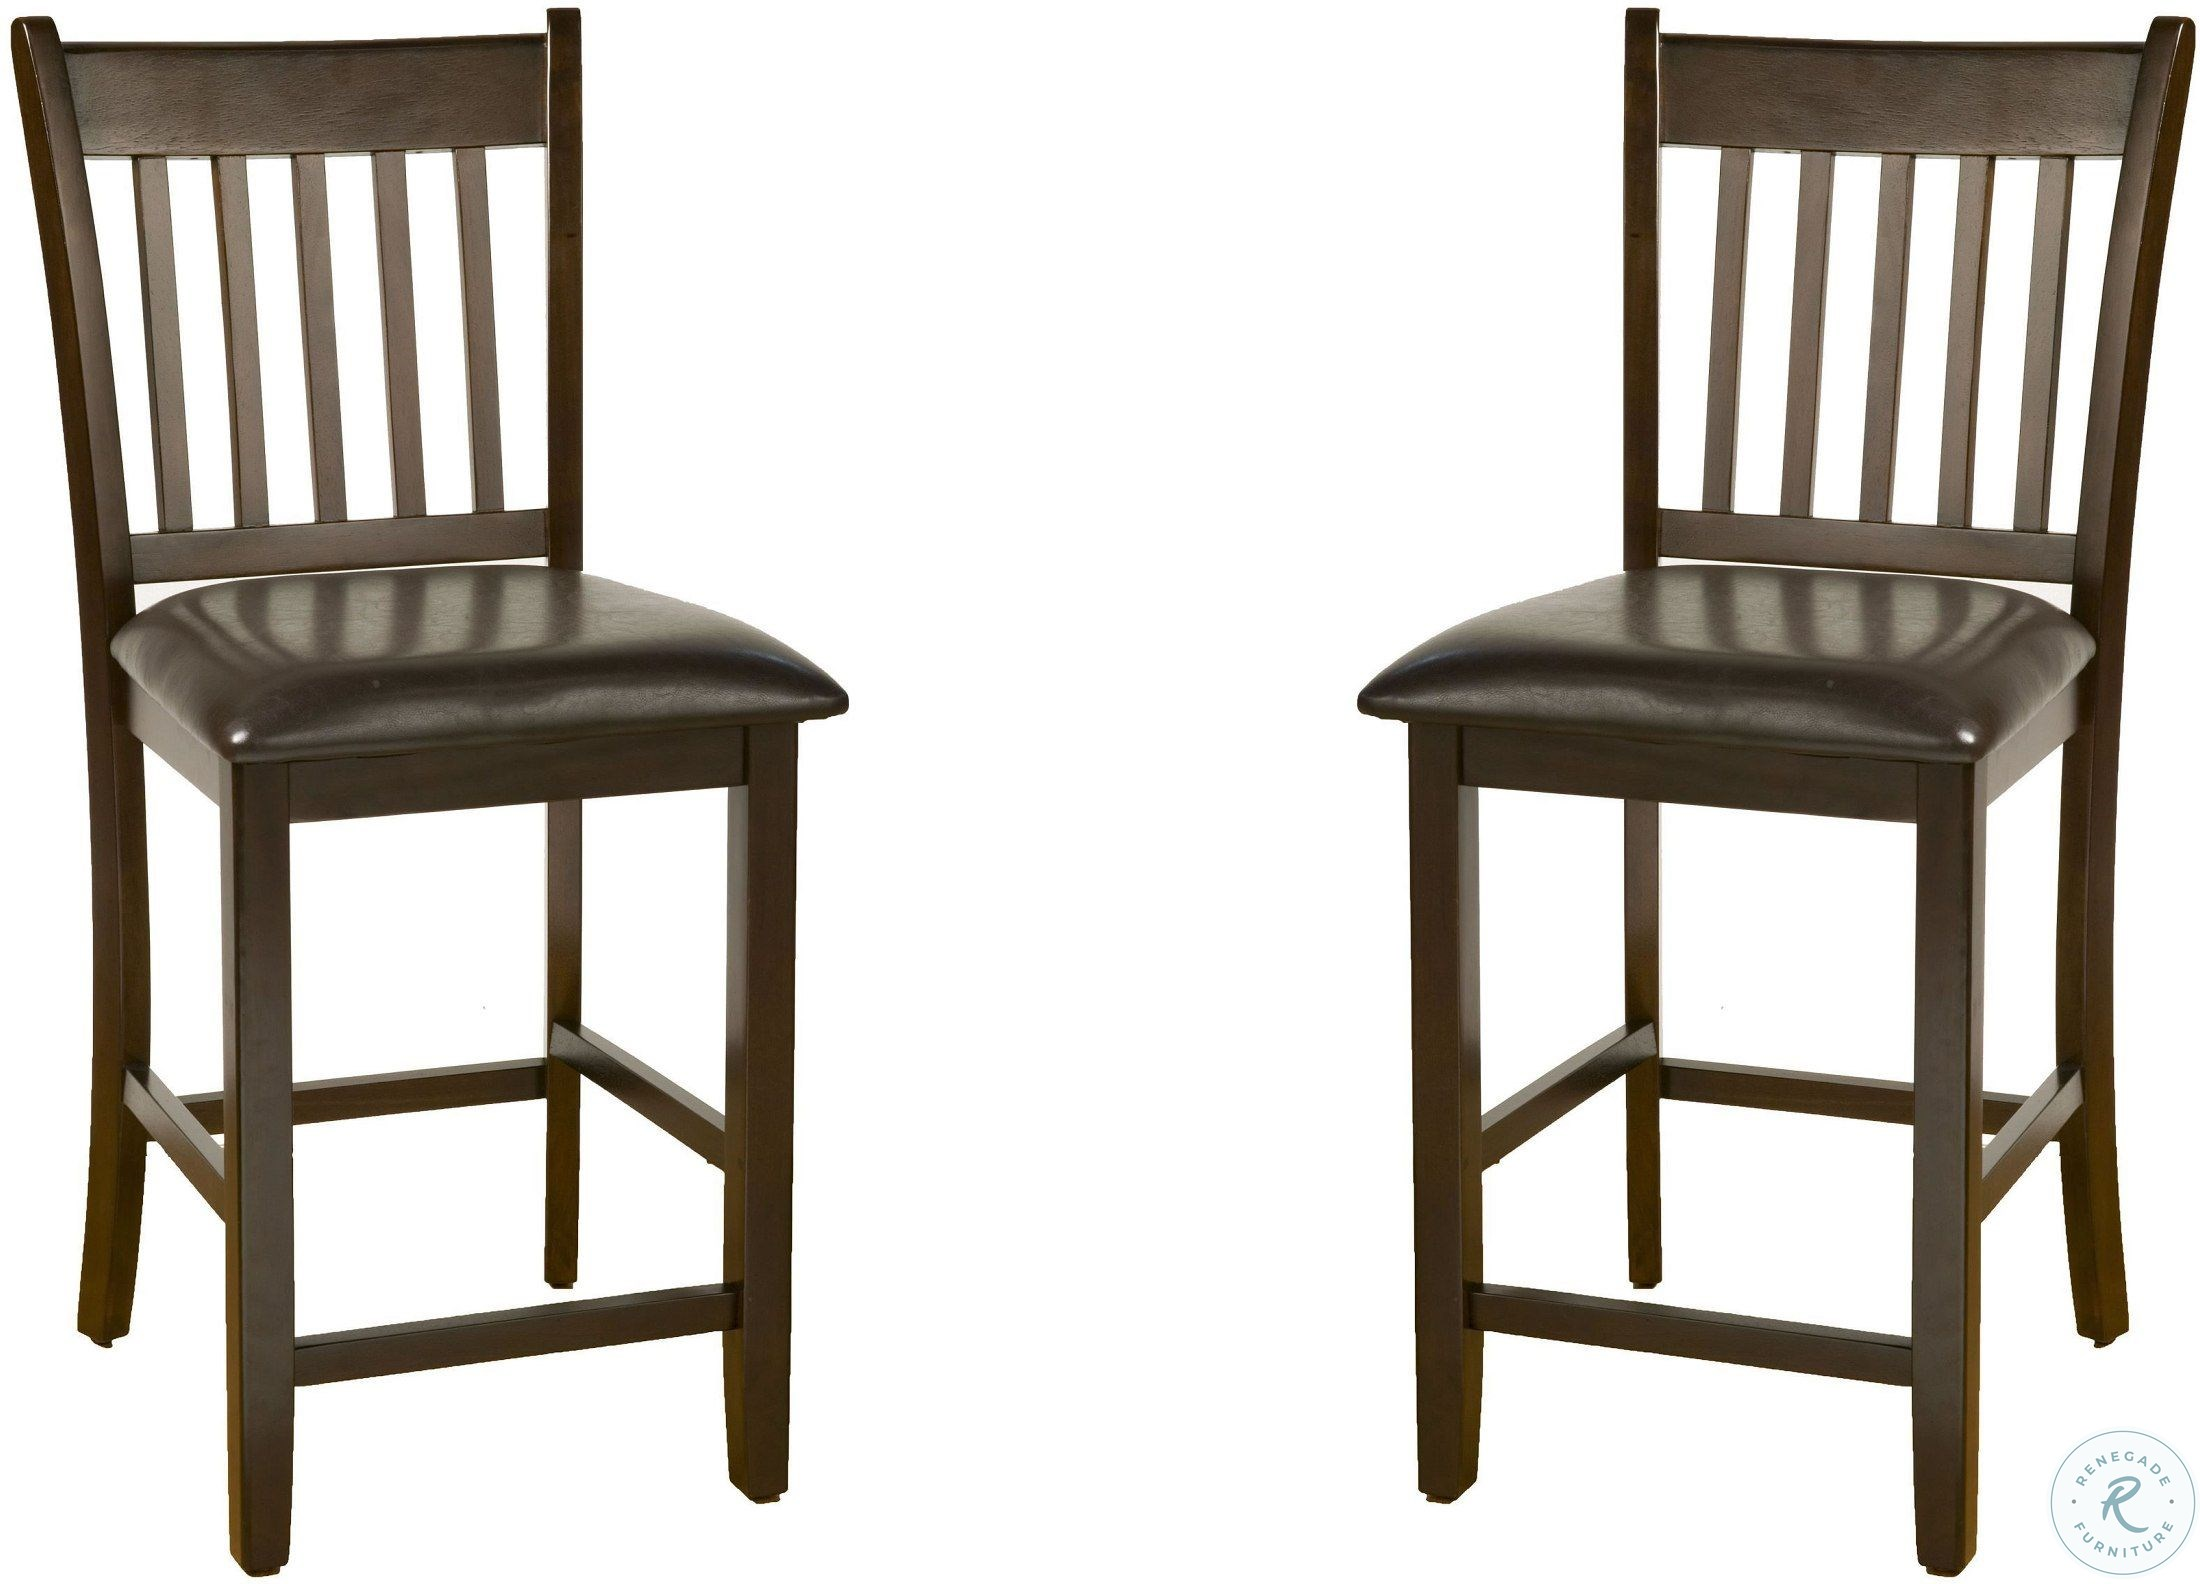 Incredible Capitola Espresso Pub Chair Set Of 2 Spiritservingveterans Wood Chair Design Ideas Spiritservingveteransorg